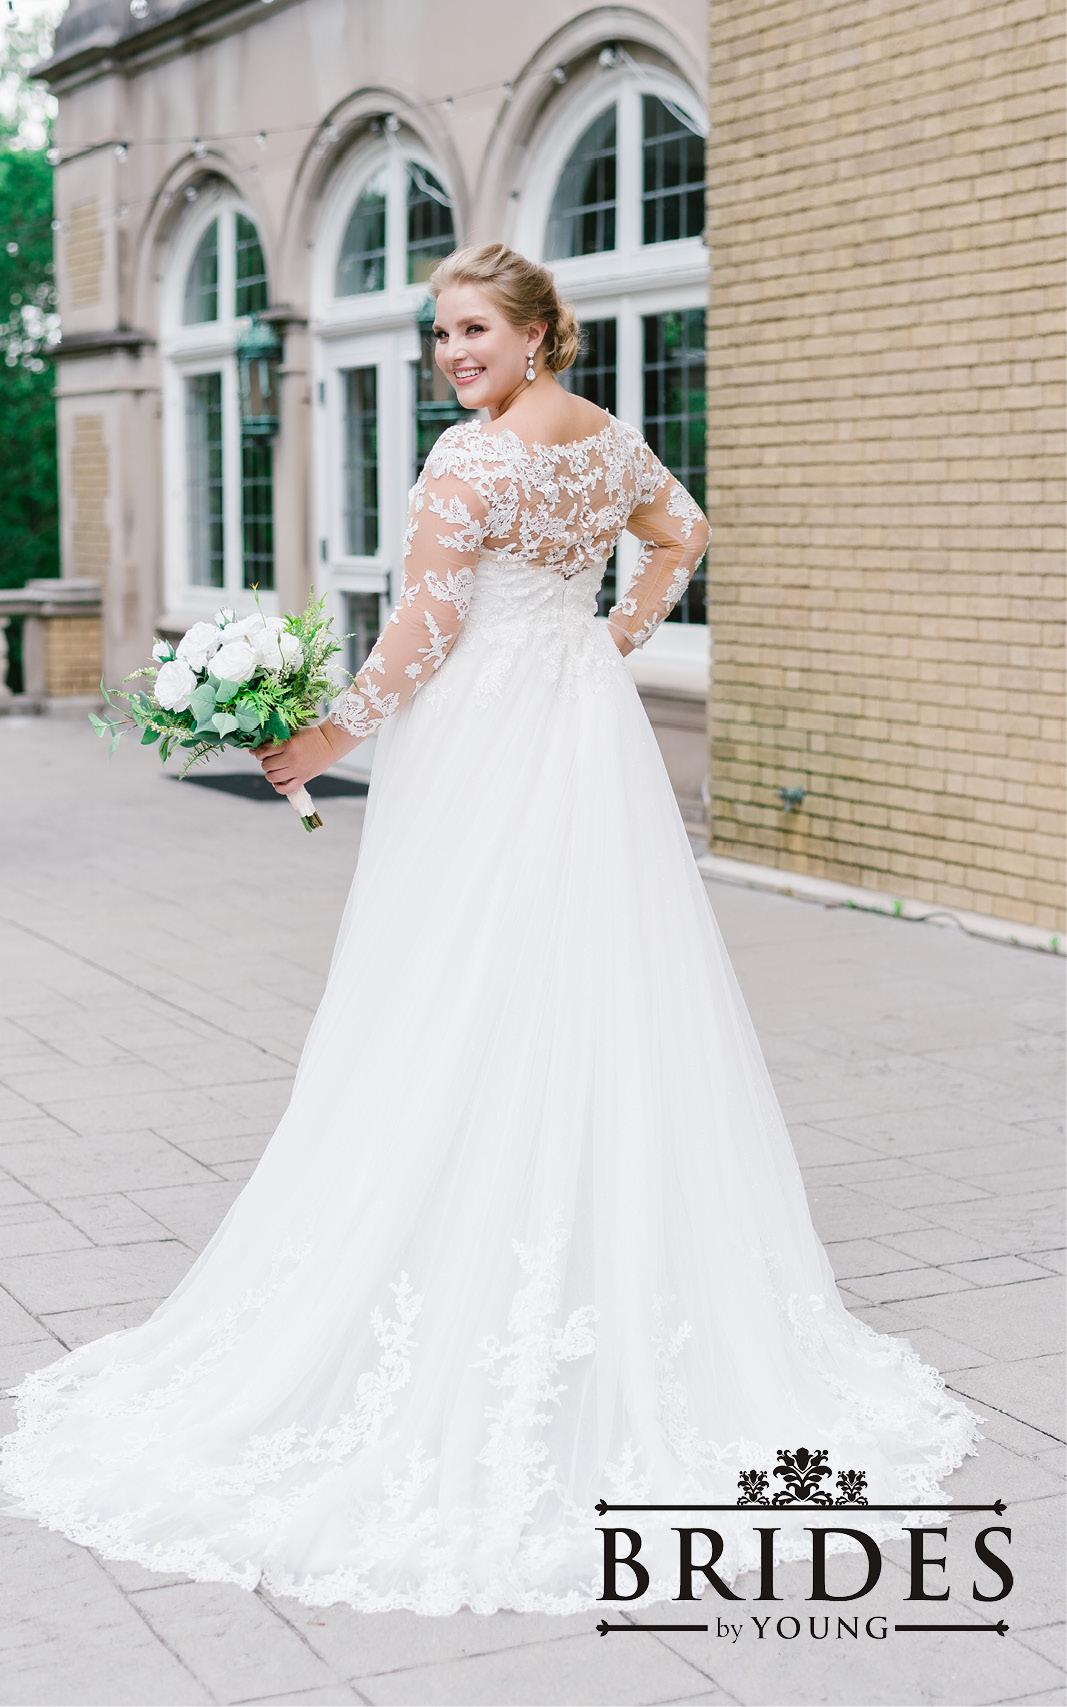 BridesbyYoung-2020Collection-PlusSizeBridalBoutique-CurvyWeddingDressInspiration-125.jpg